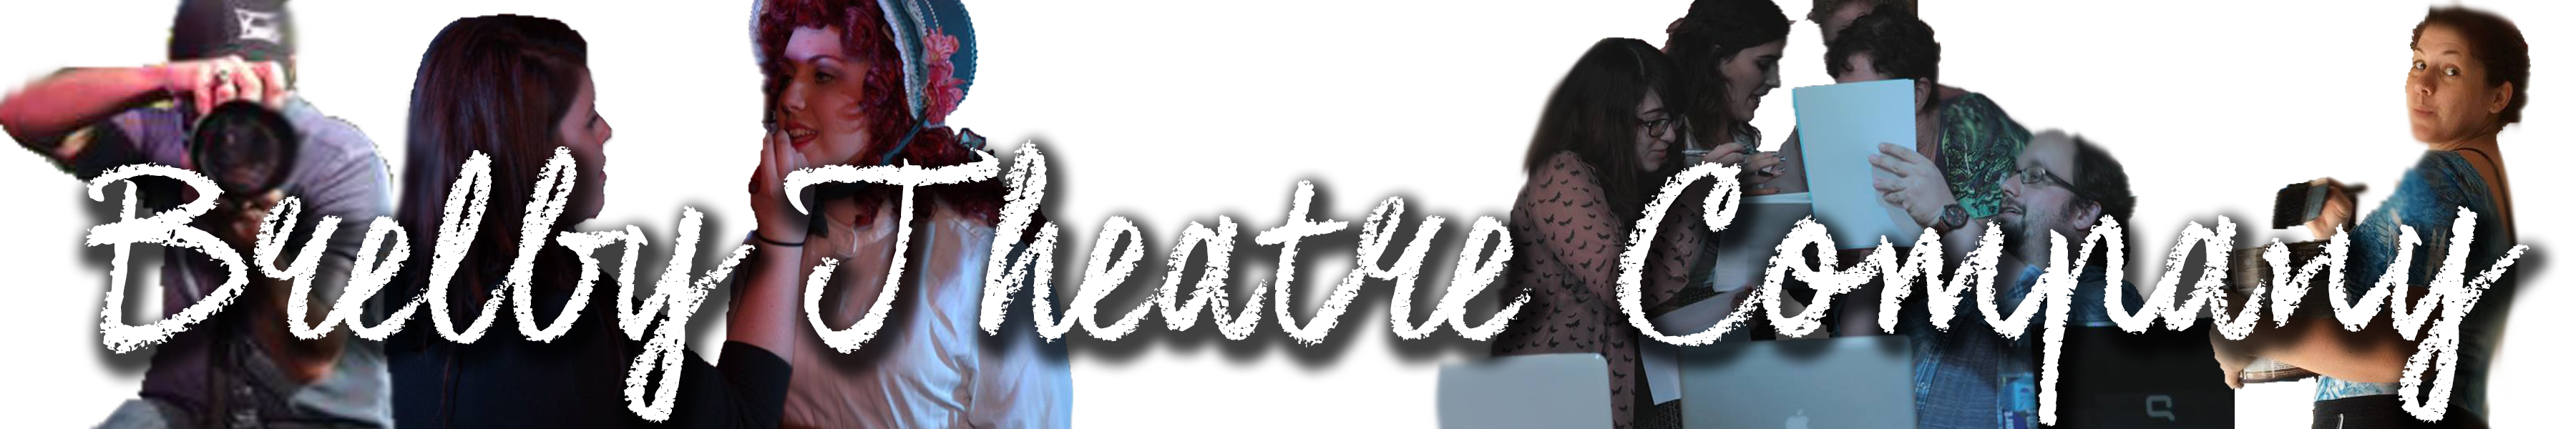 Brelby Theatre Company logo